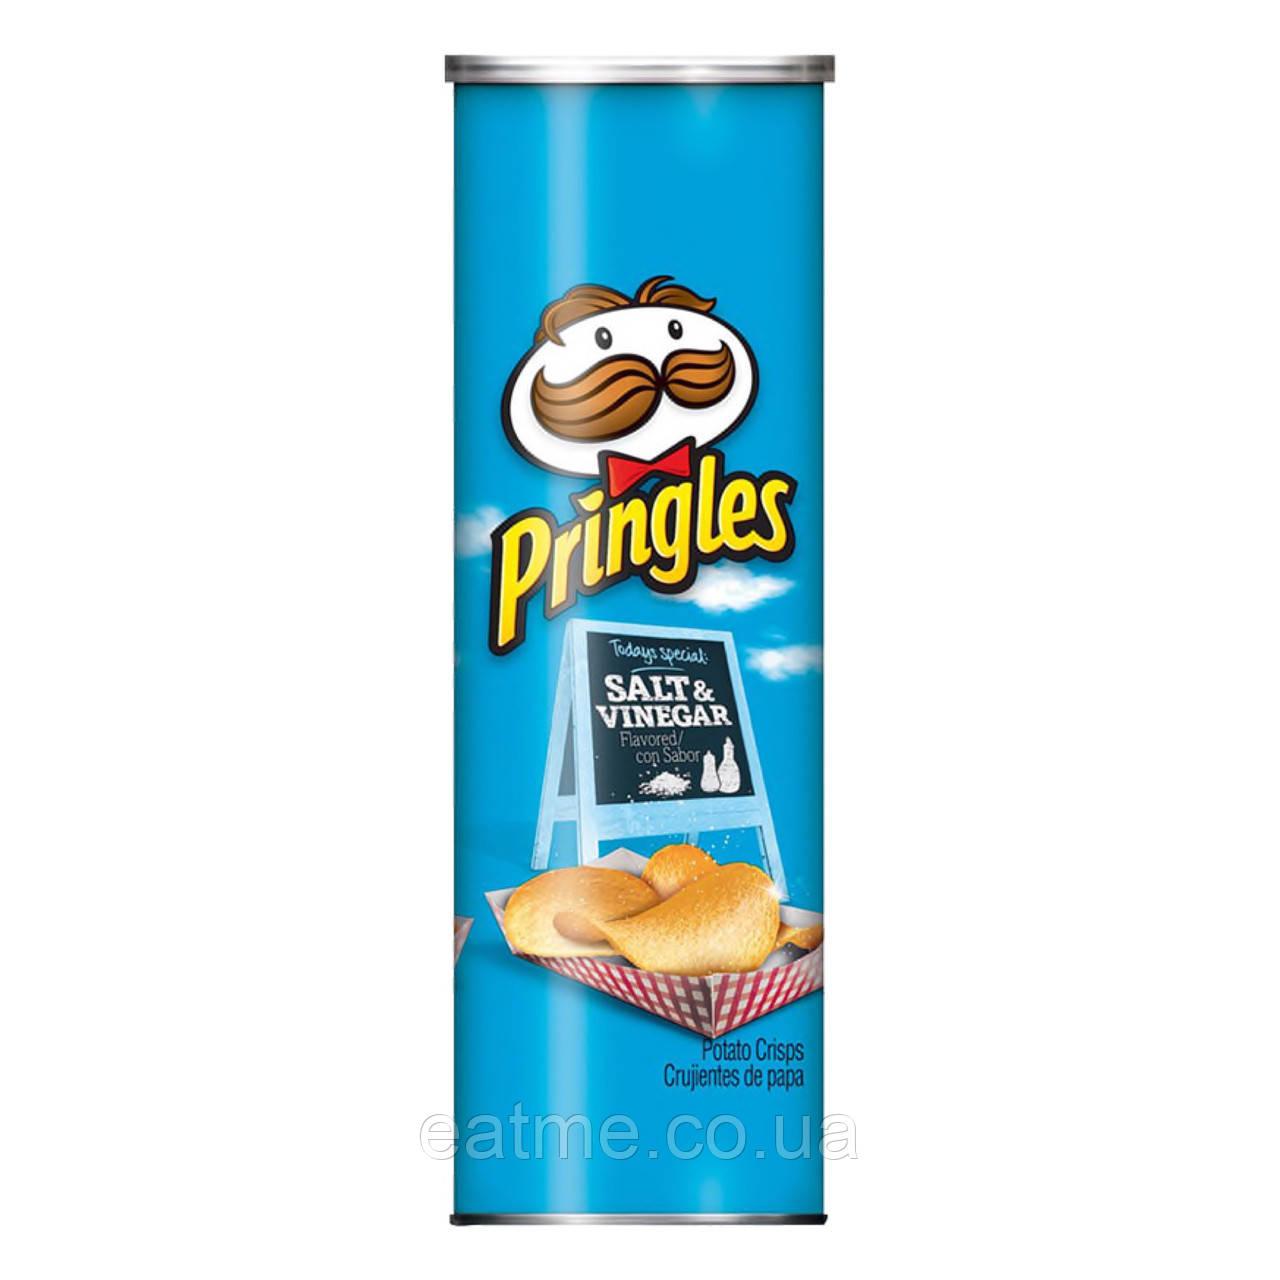 Pringles Соль и уксус